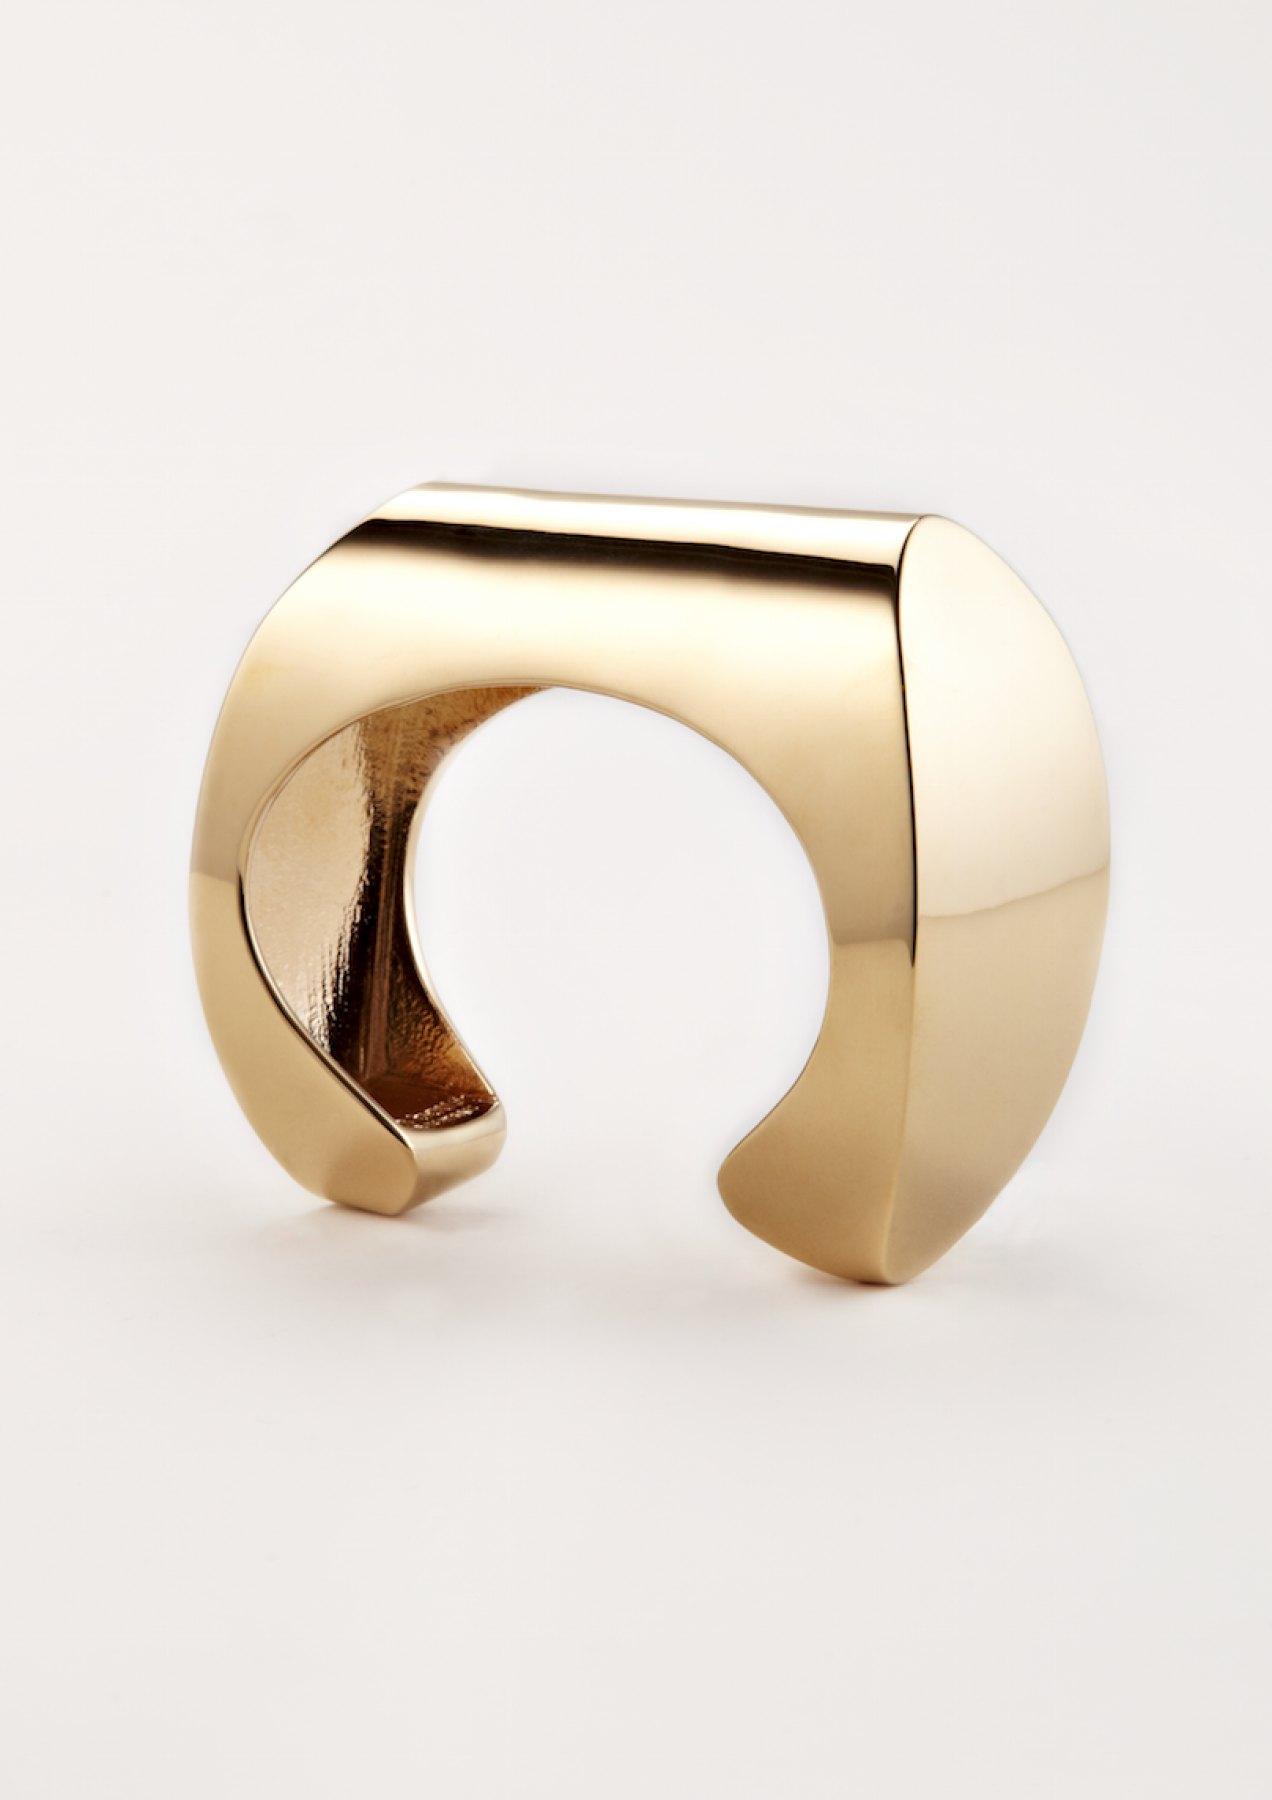 xenia bous schmuck Golden Stone 34 Cuff Armband gold silber